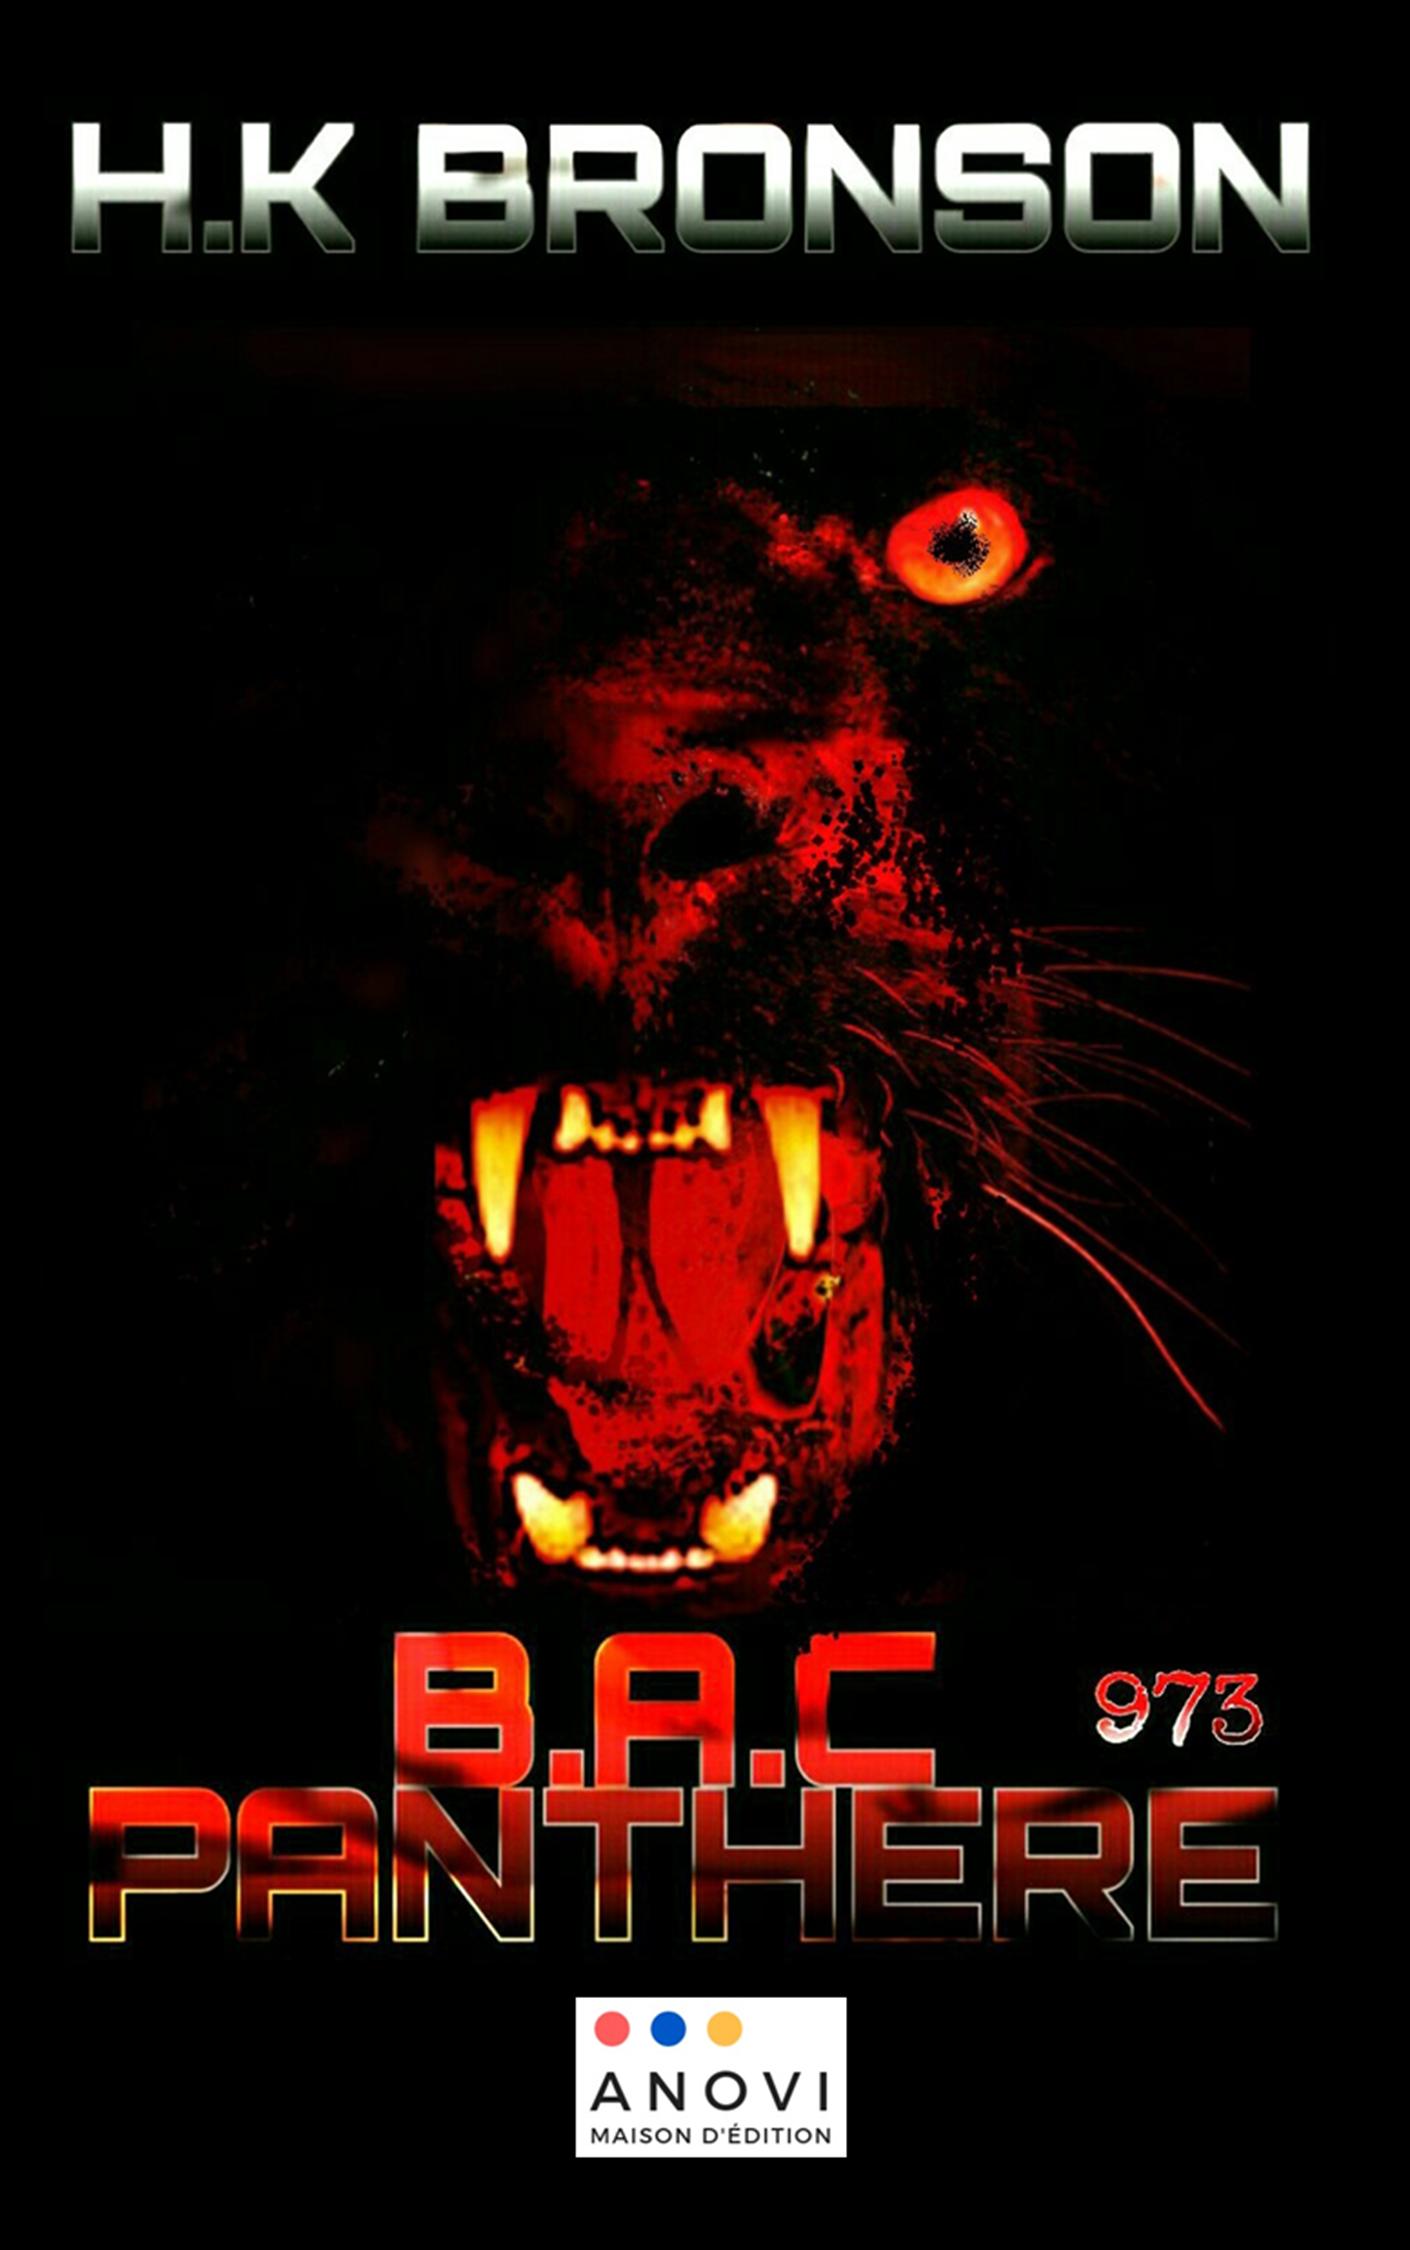 BAC Panthère 973 Image